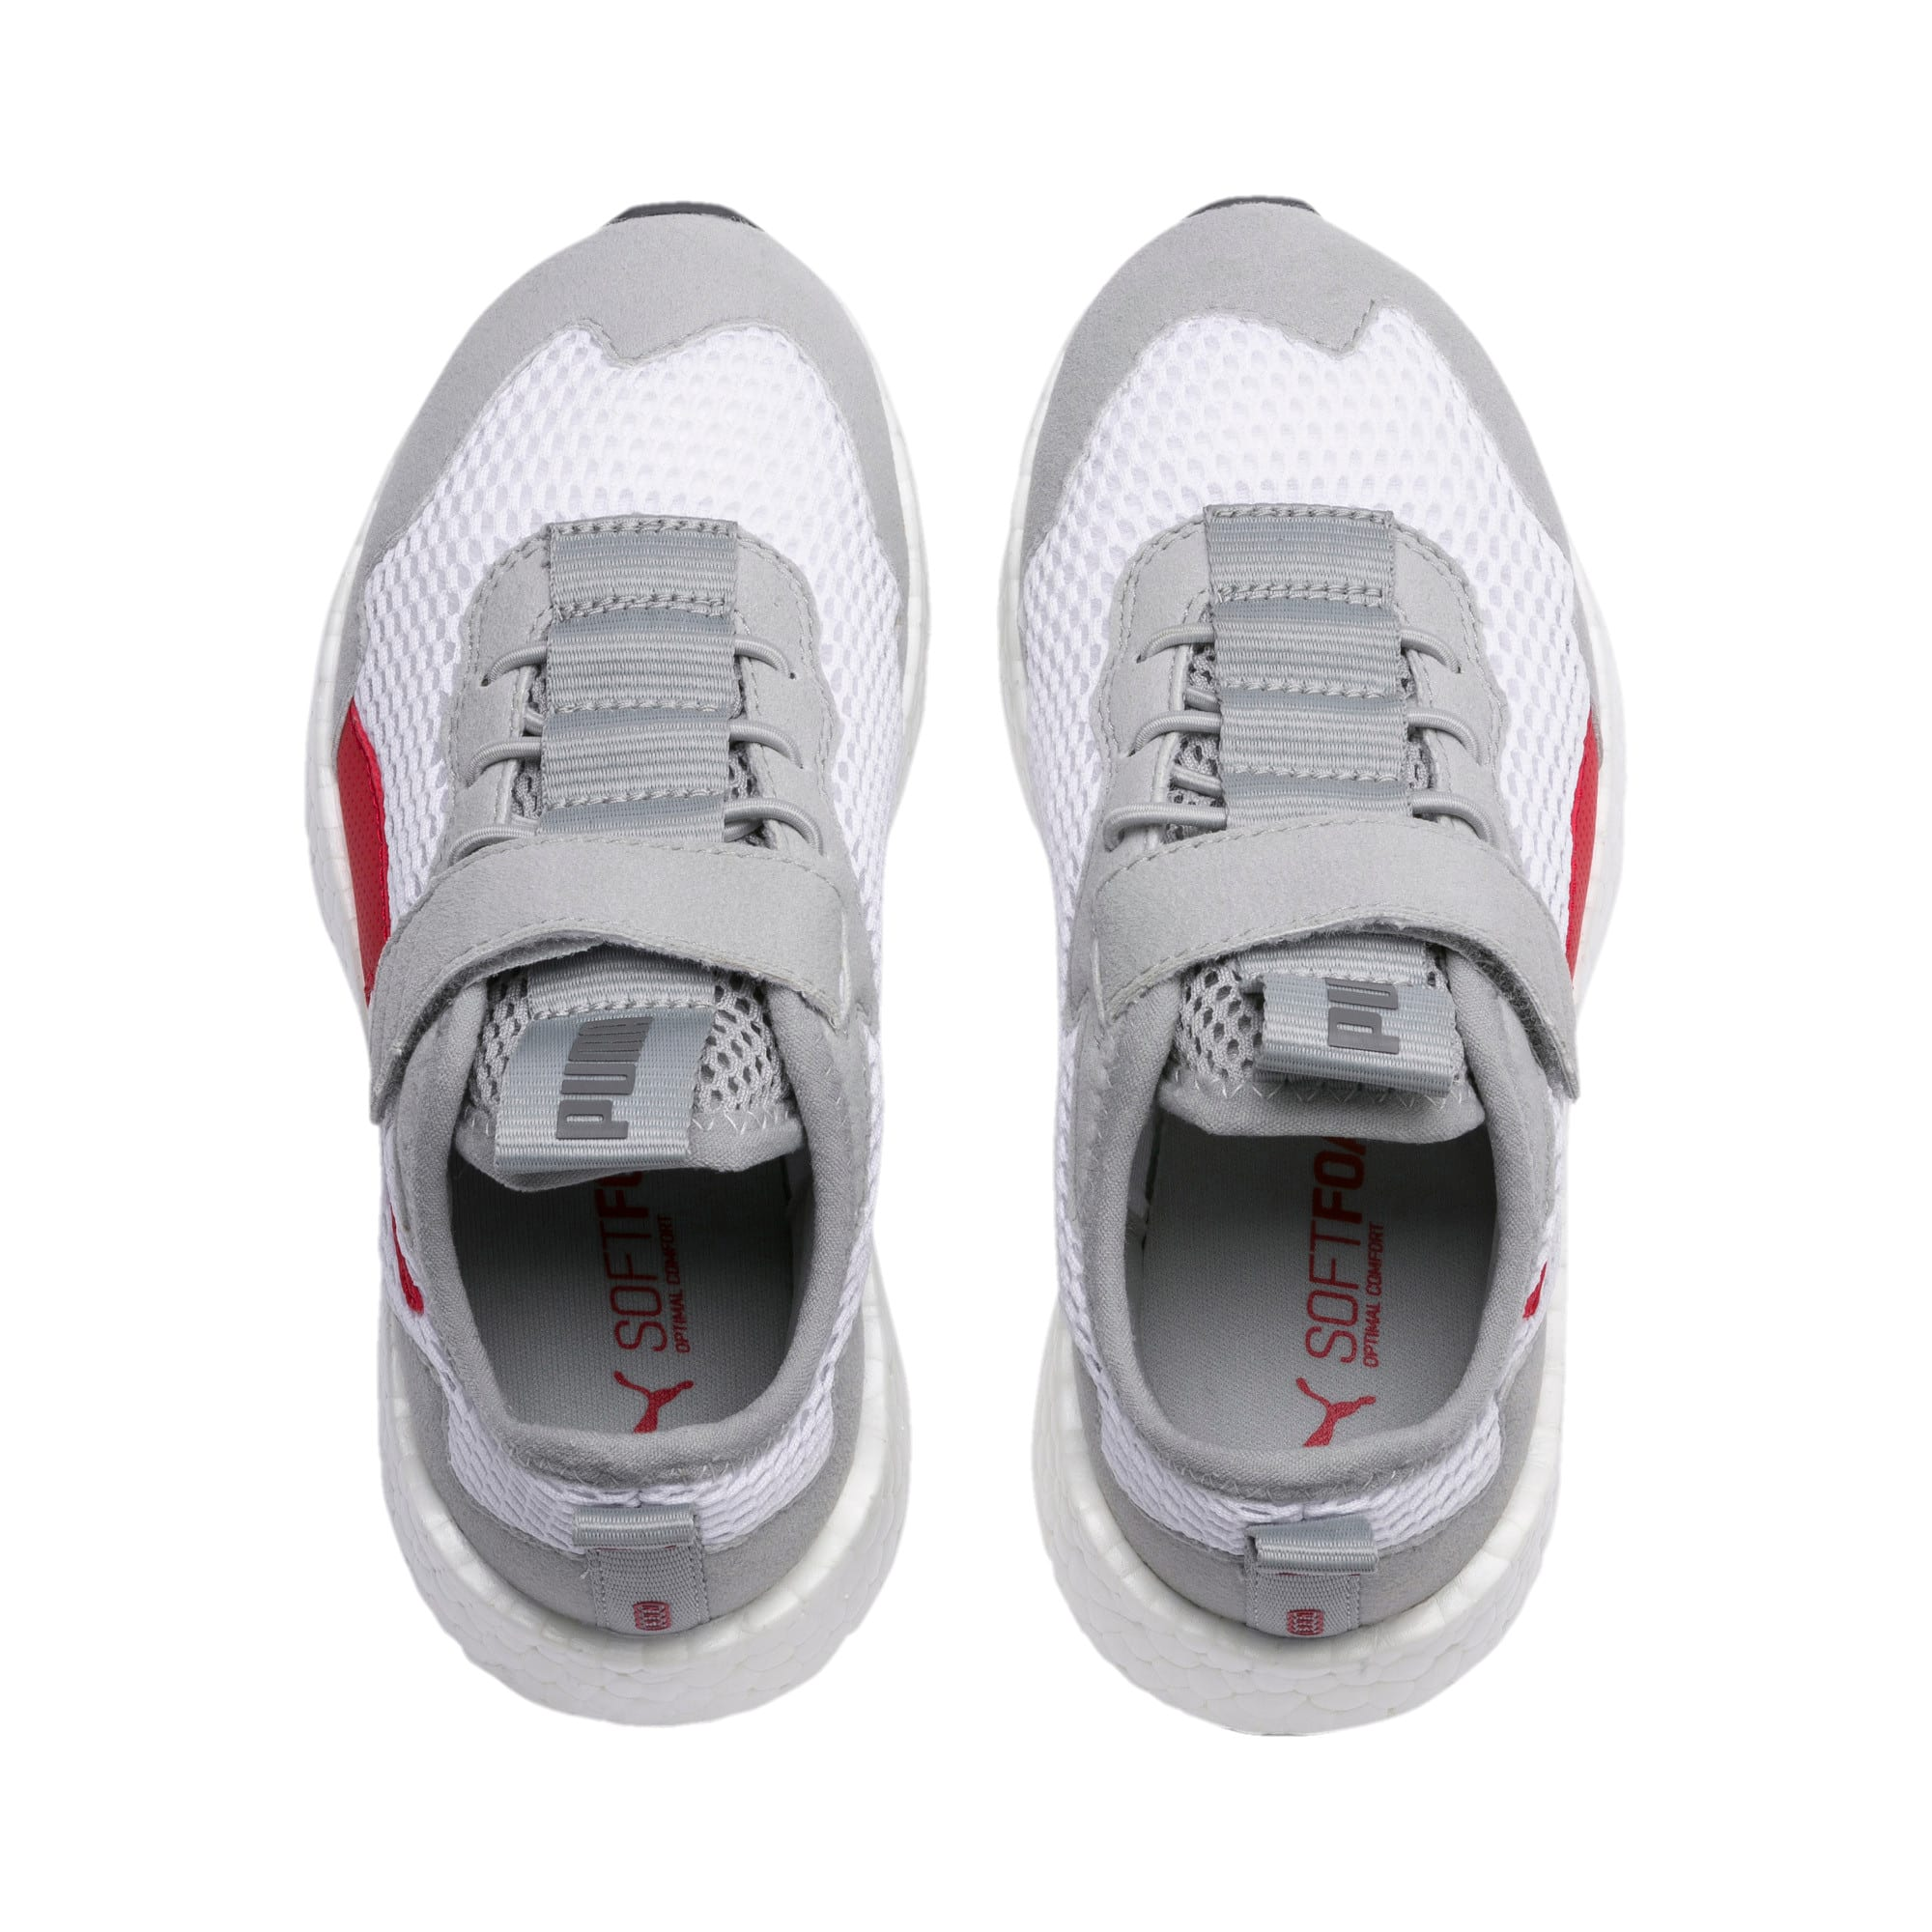 Thumbnail 6 of NRGY Neko Skim AC Shoes PS, White-H Rise-CASTLEROCK-Red, medium